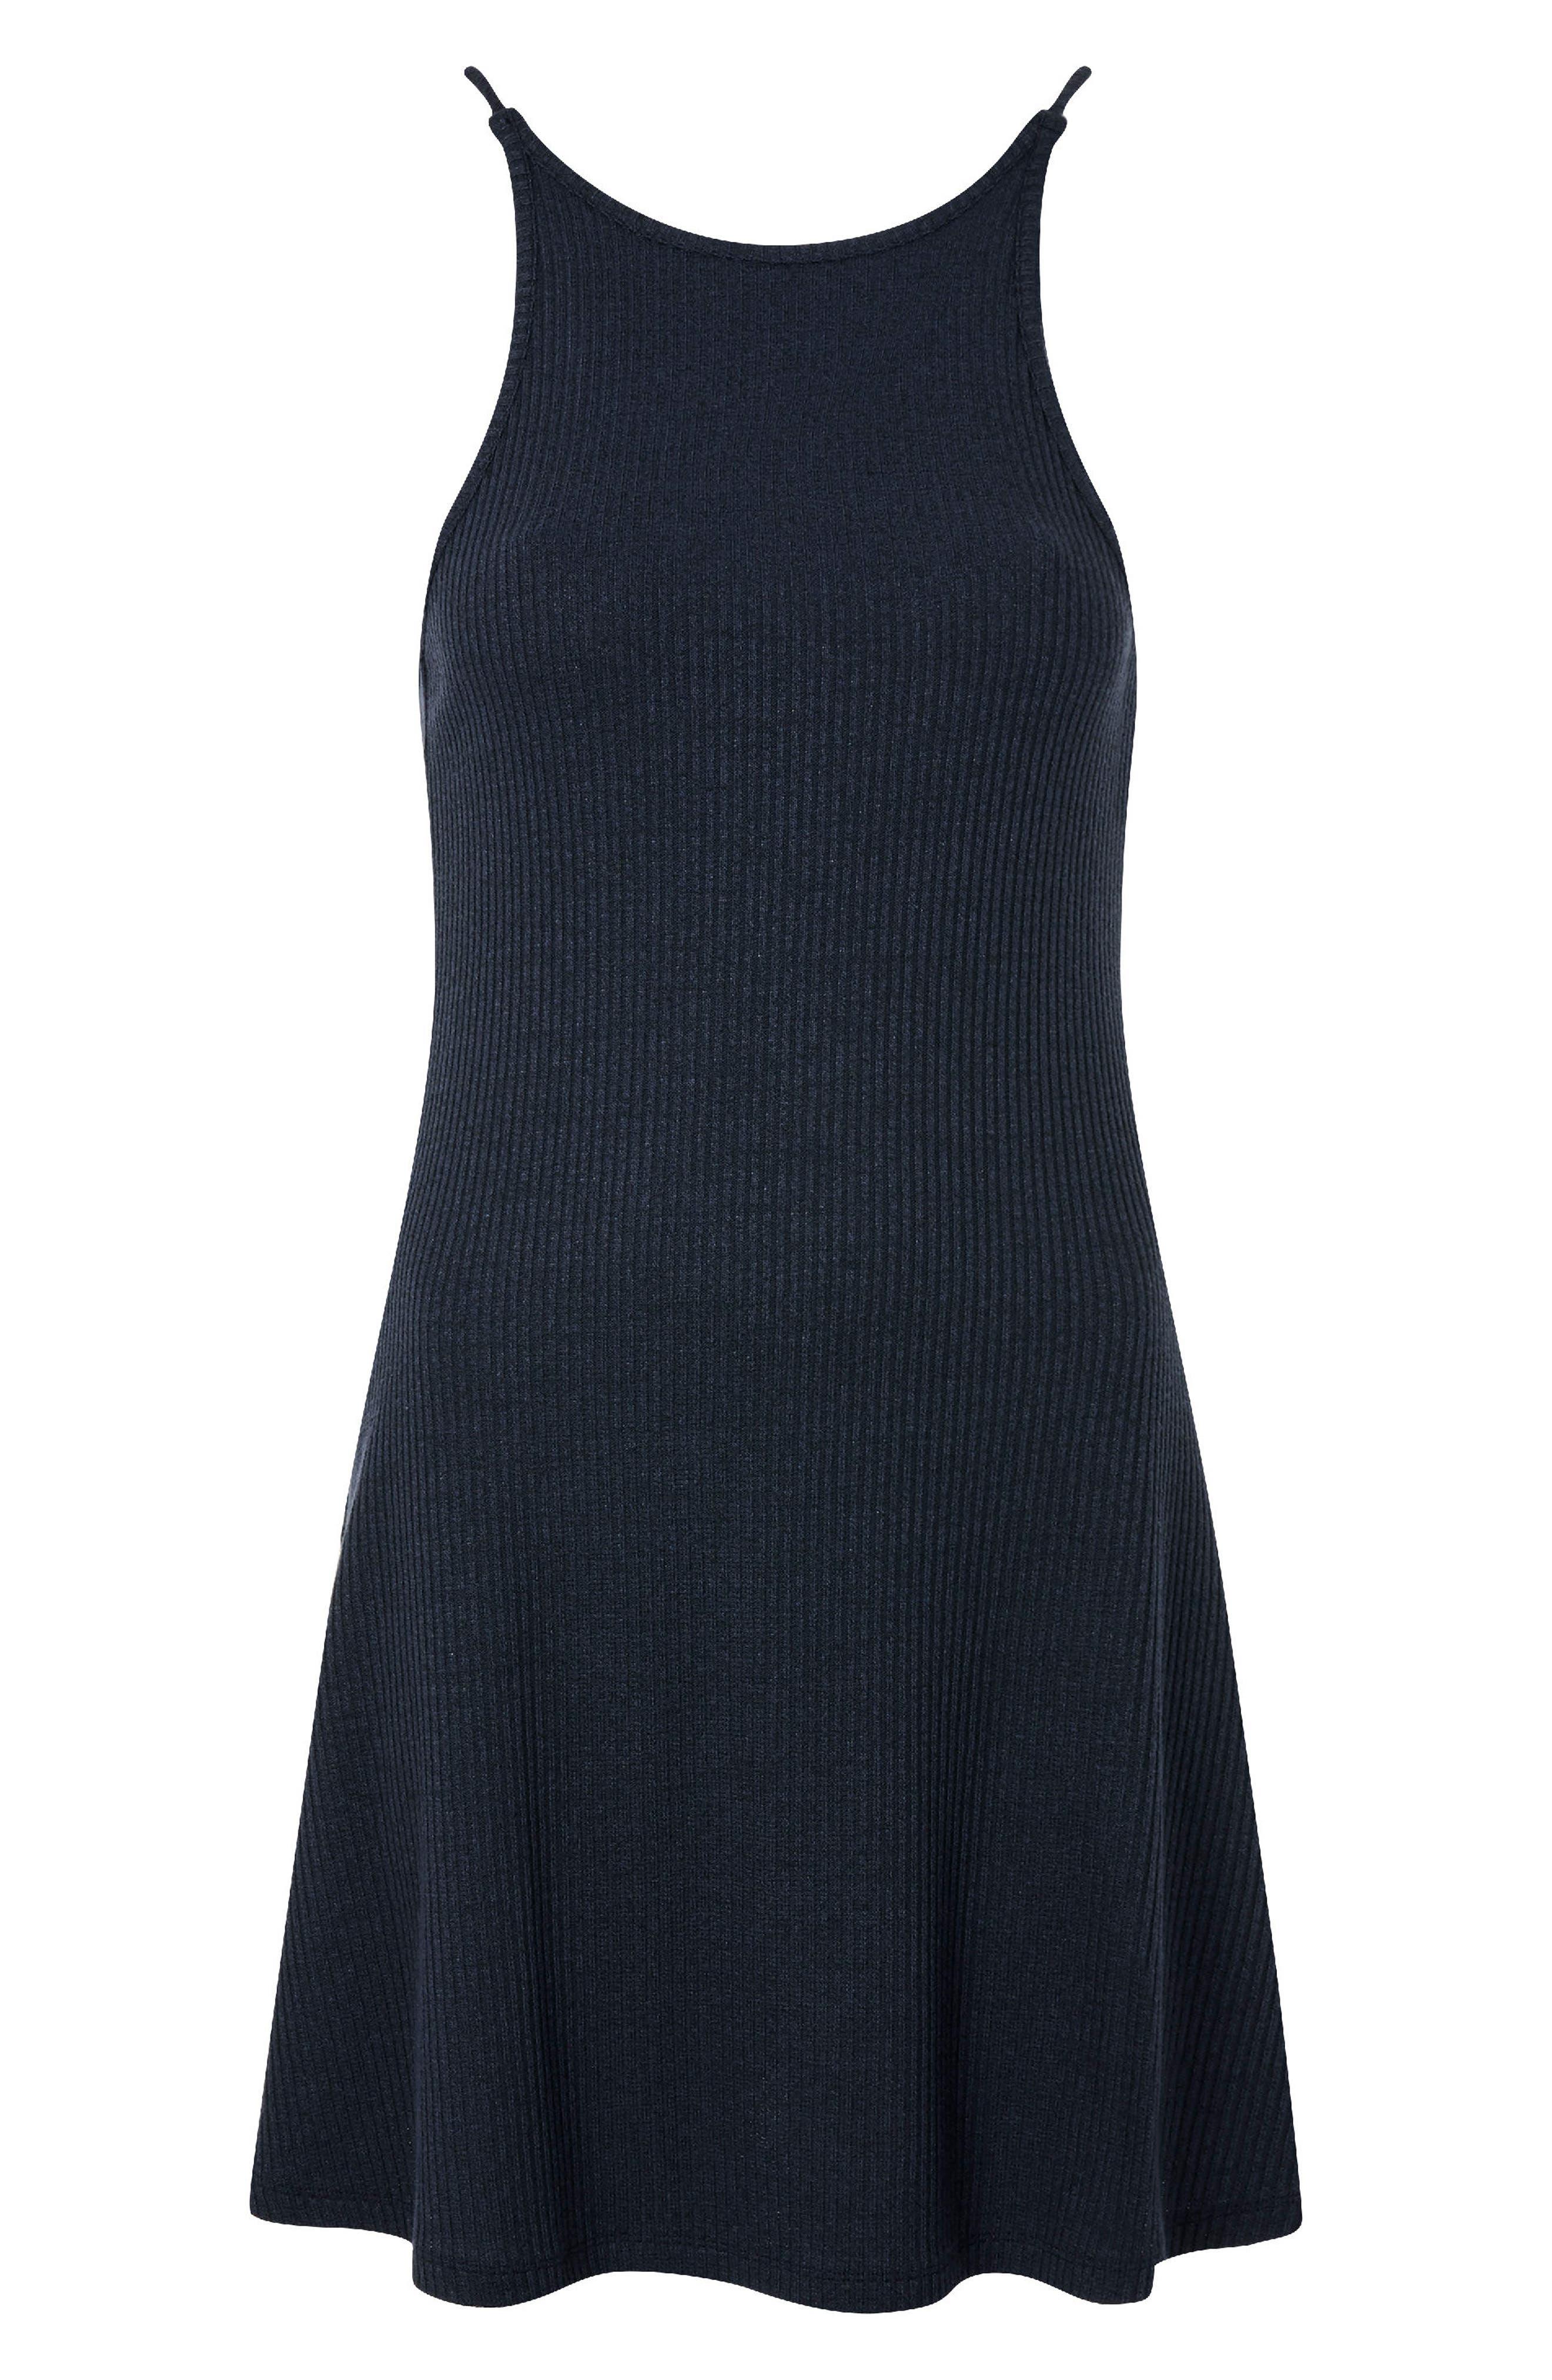 Scoop Back Ribbed Minidress,                             Alternate thumbnail 4, color,                             Navy Blue